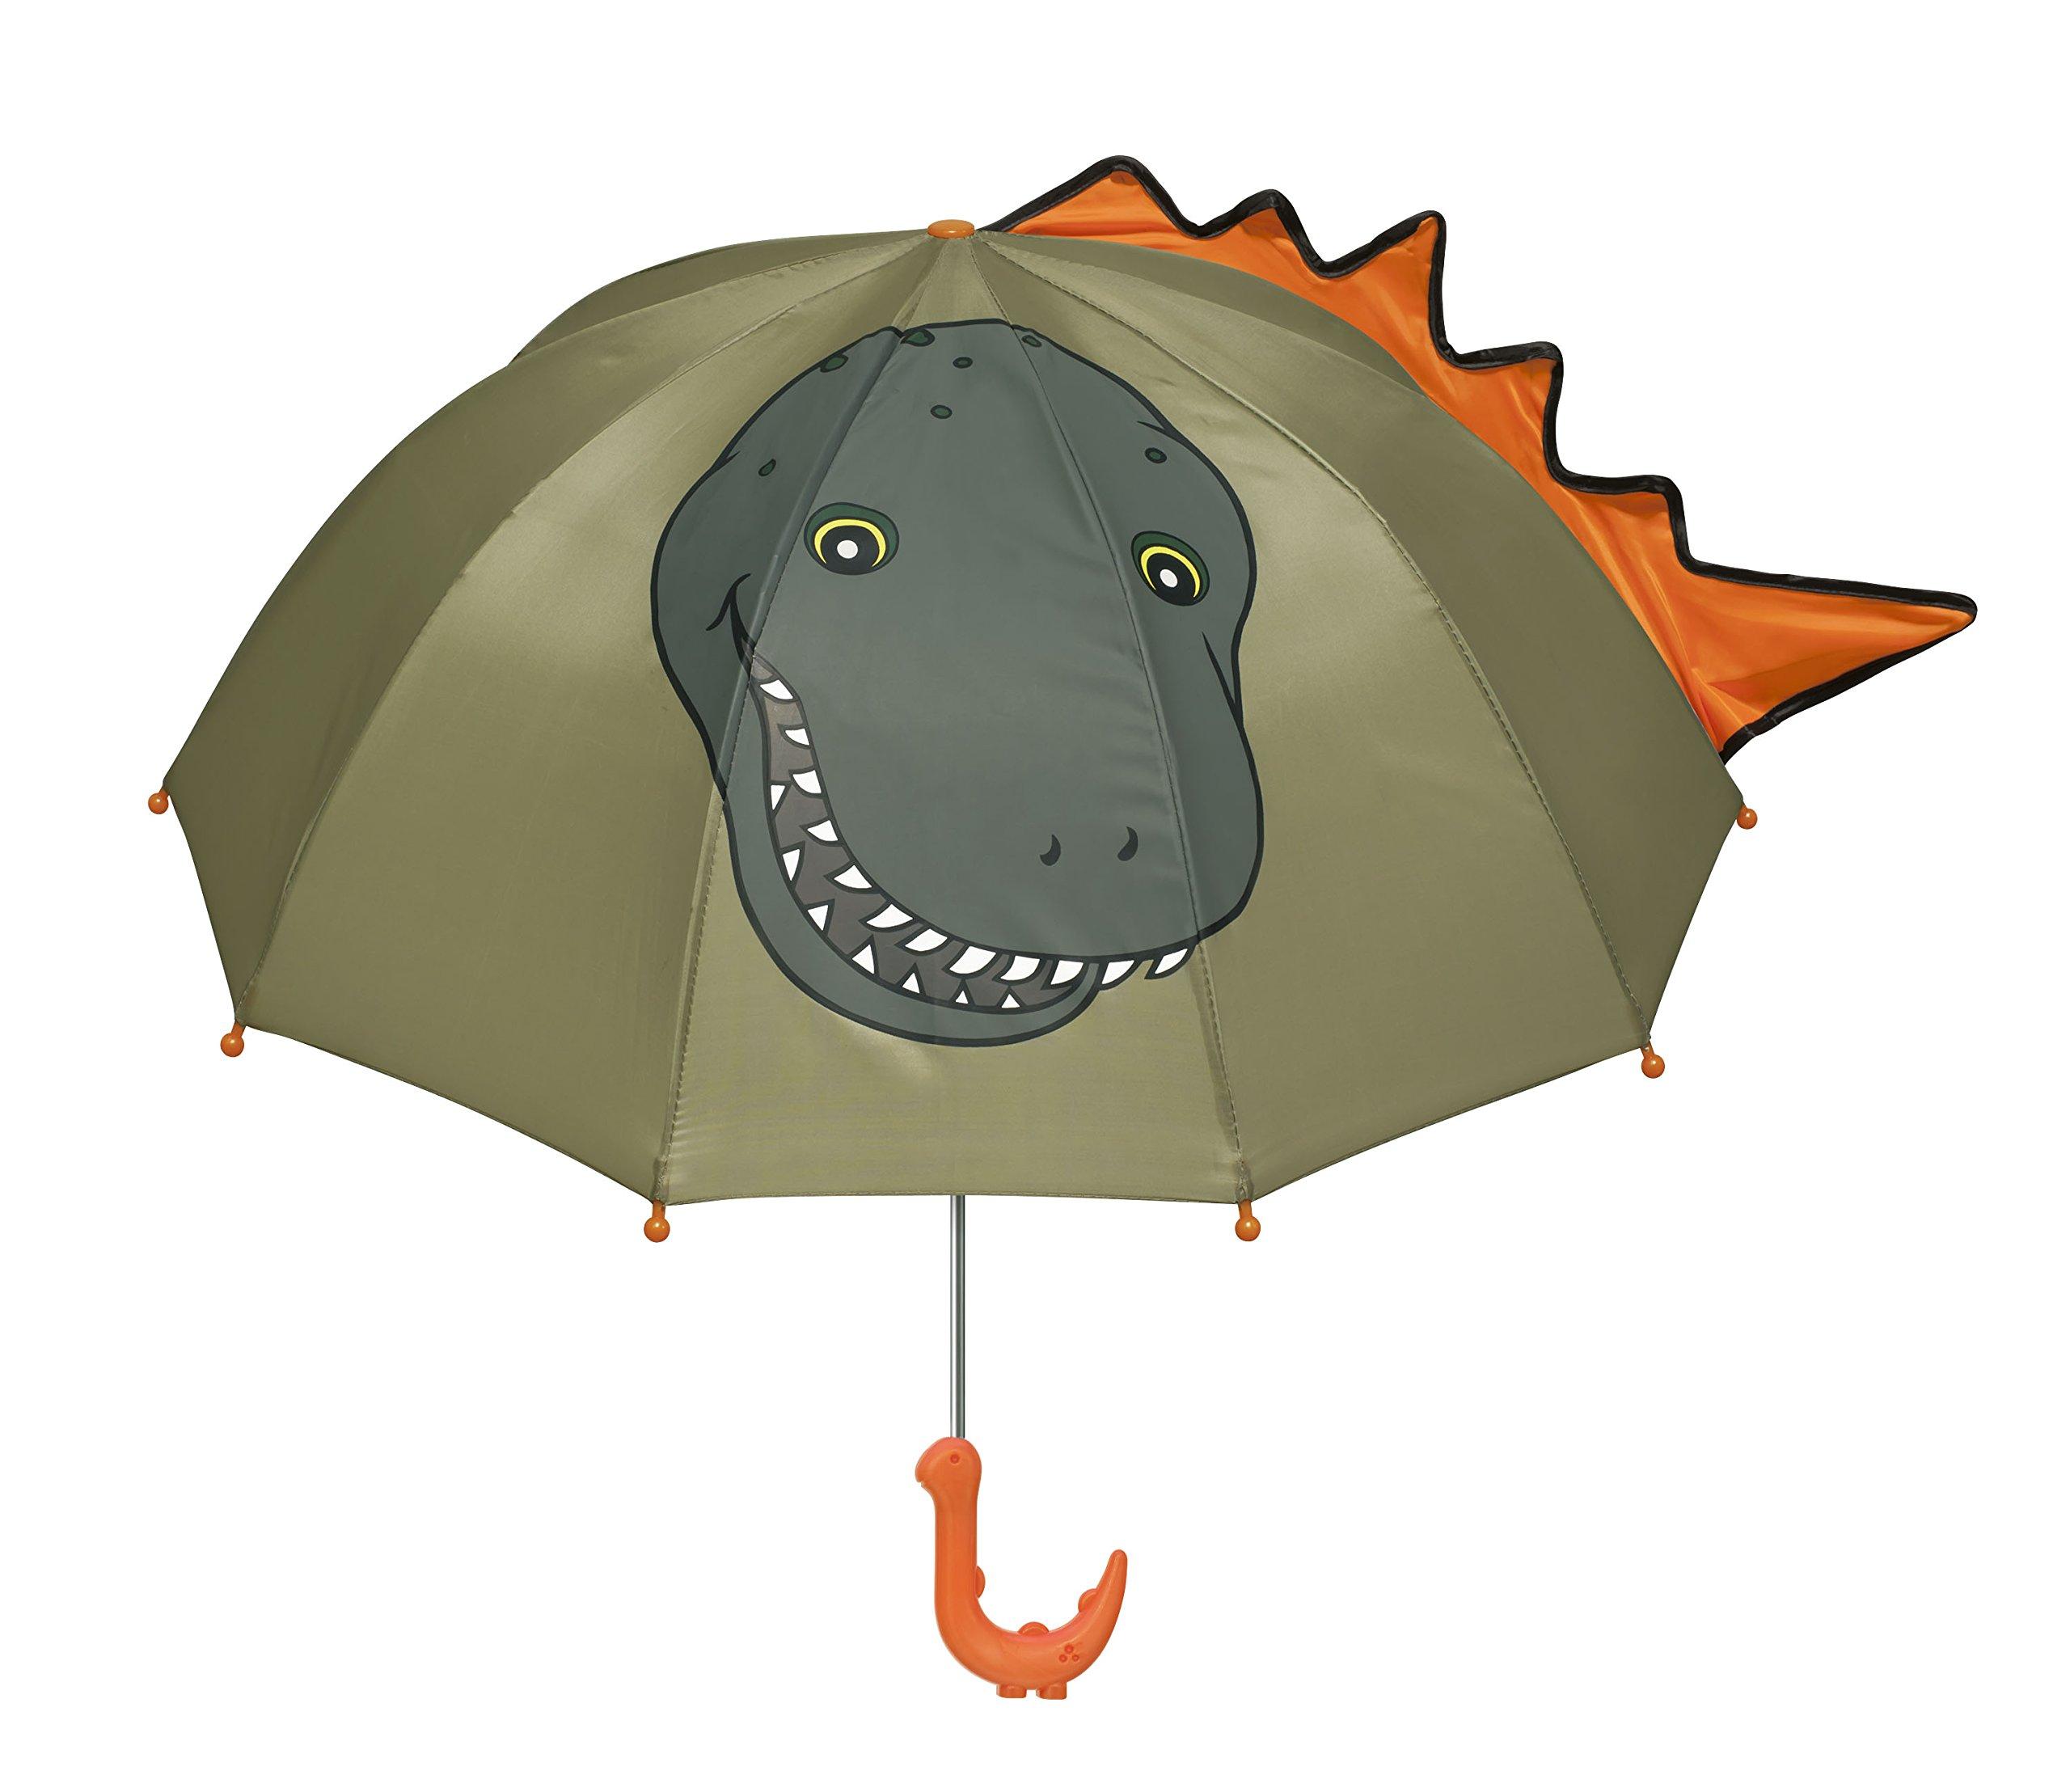 Kidorable Boys' Dinosaur Umbrella, Green, One Size by Kidorable